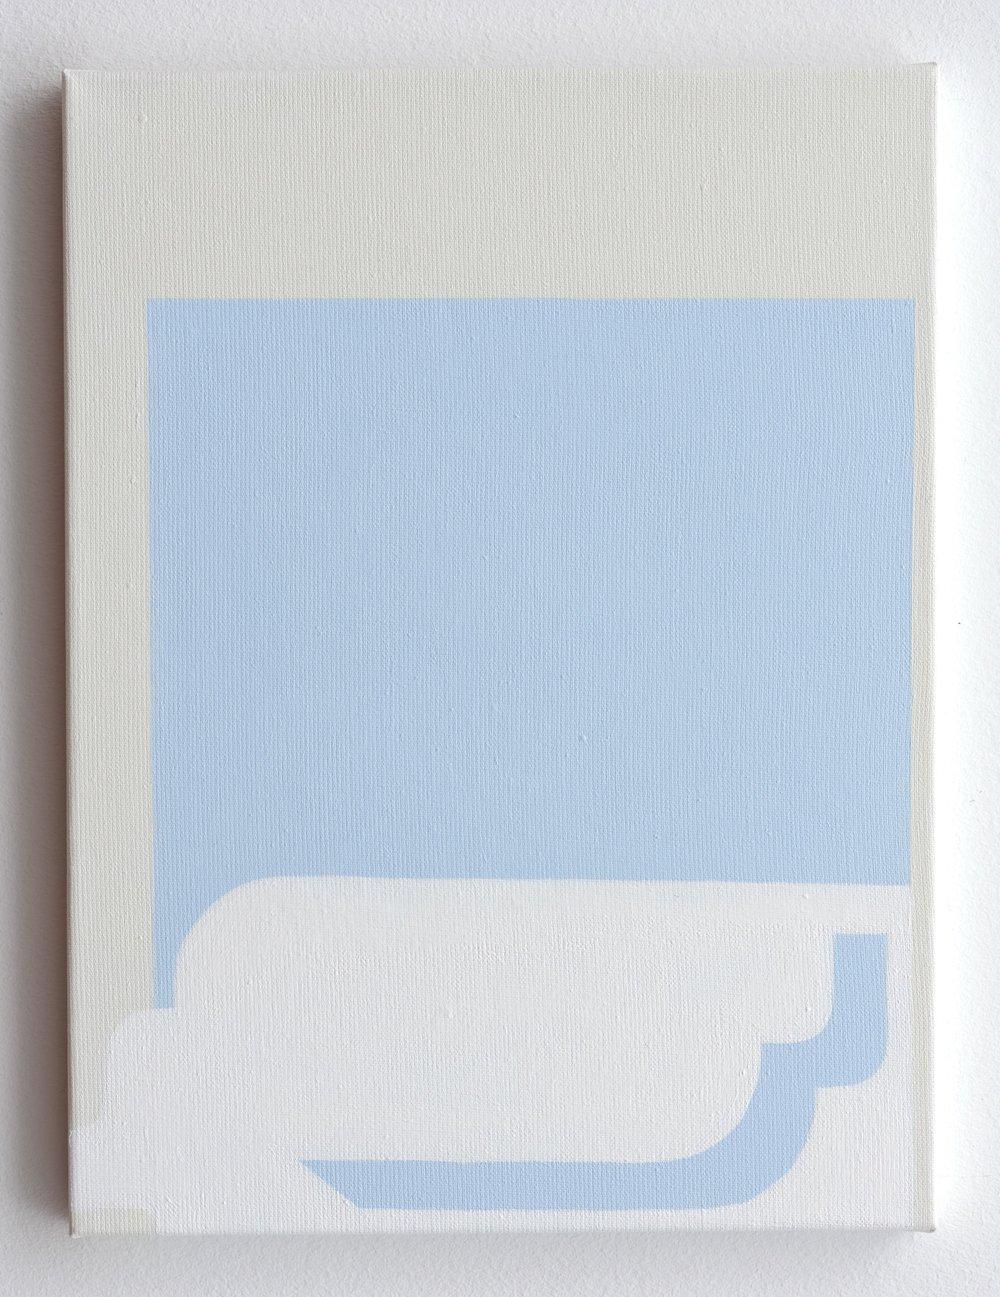 24.  Blue Brut c , Lina Kim, 2018. Casanova Art Gallery, São Paulo - London Art Fair. Courtesy of Casanova Art Gallery.